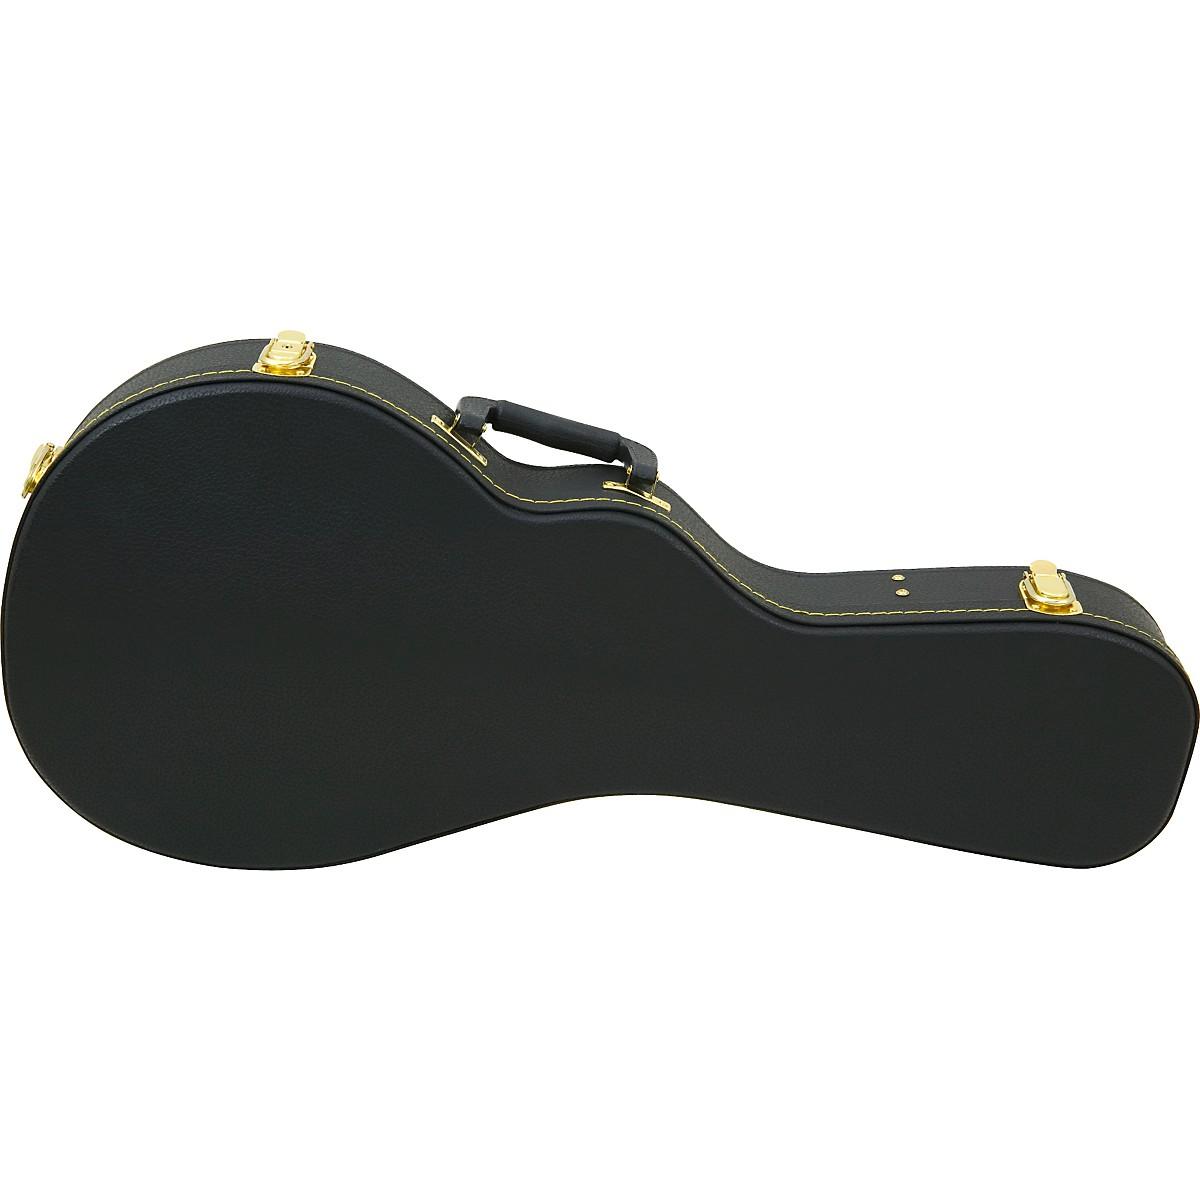 Musician's Gear F-Style Mandolin Hardshell Case